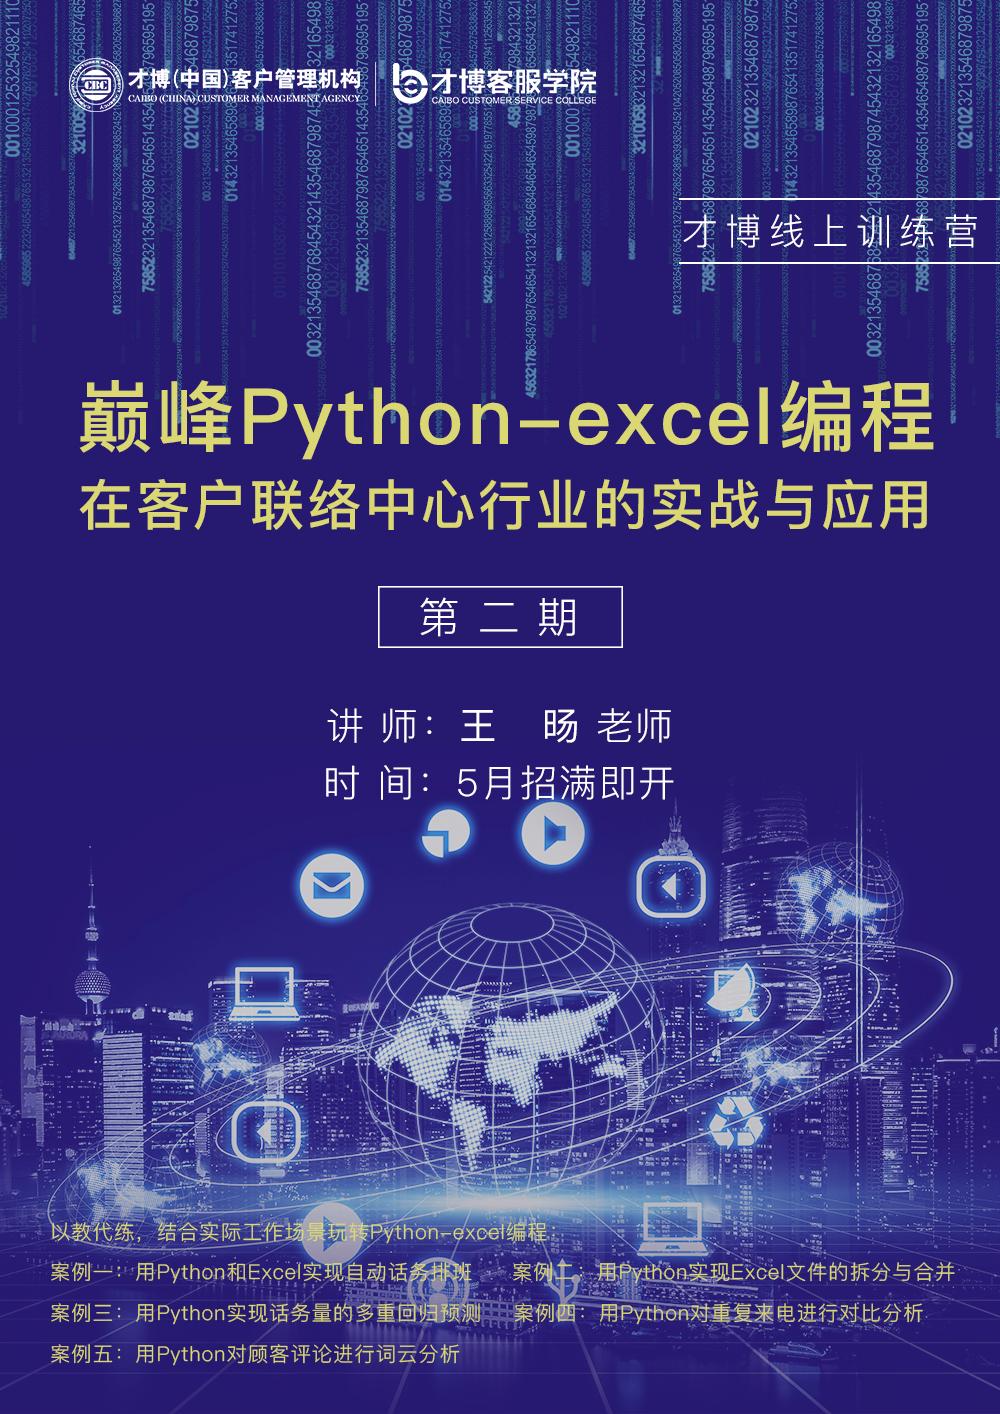 <b>【才博线上训练营】巅峰Python-excel编程在客户联络中心行业的实战与应用</b>